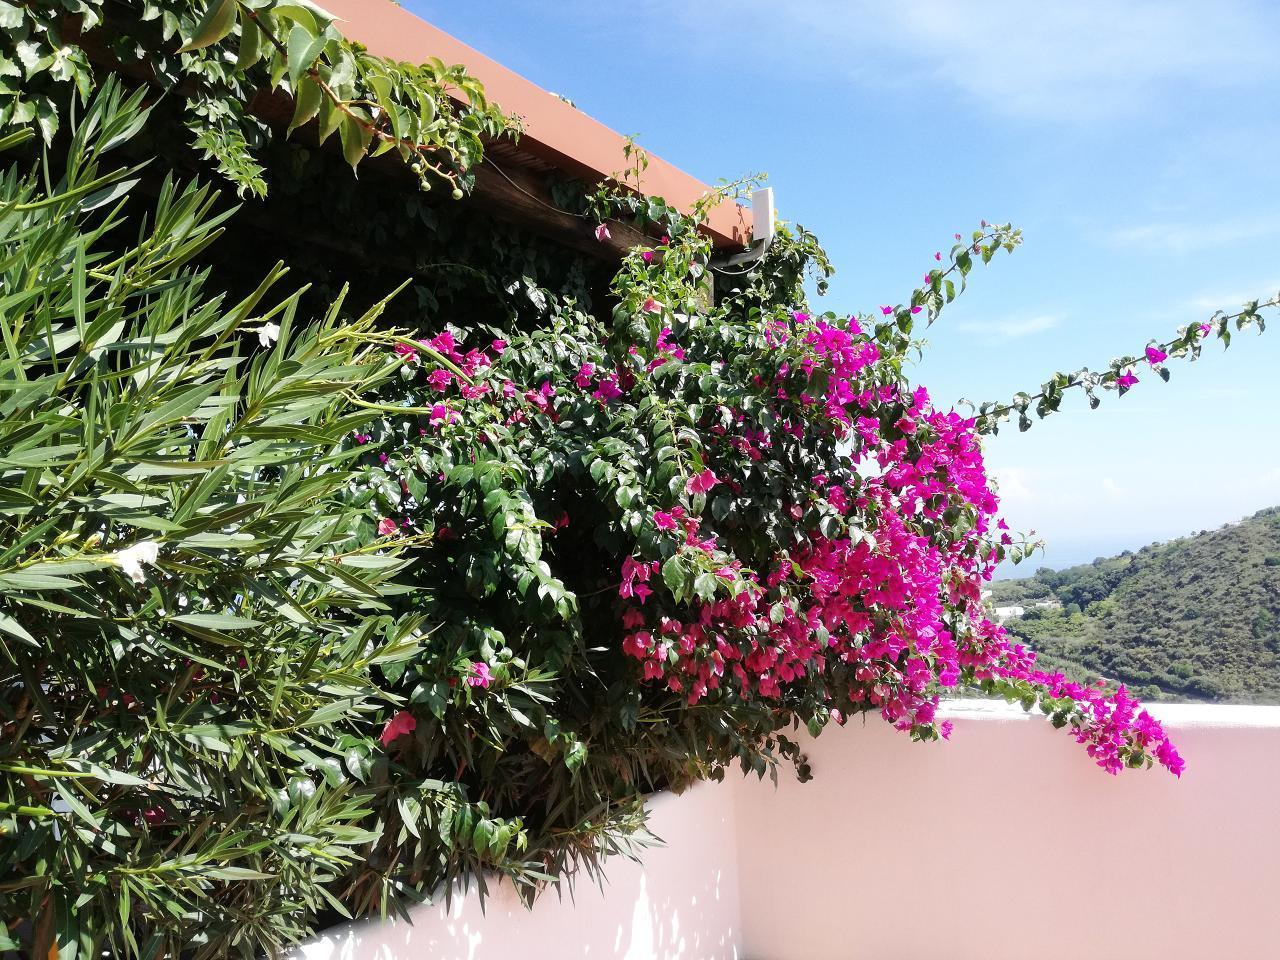 Maison de vacances Ferienhaushälfte Solandra auf sizilianischer Insel mit atemberaubenden Meeres-Rundblick (2038046), Lipari, Lipari, Sicile, Italie, image 42